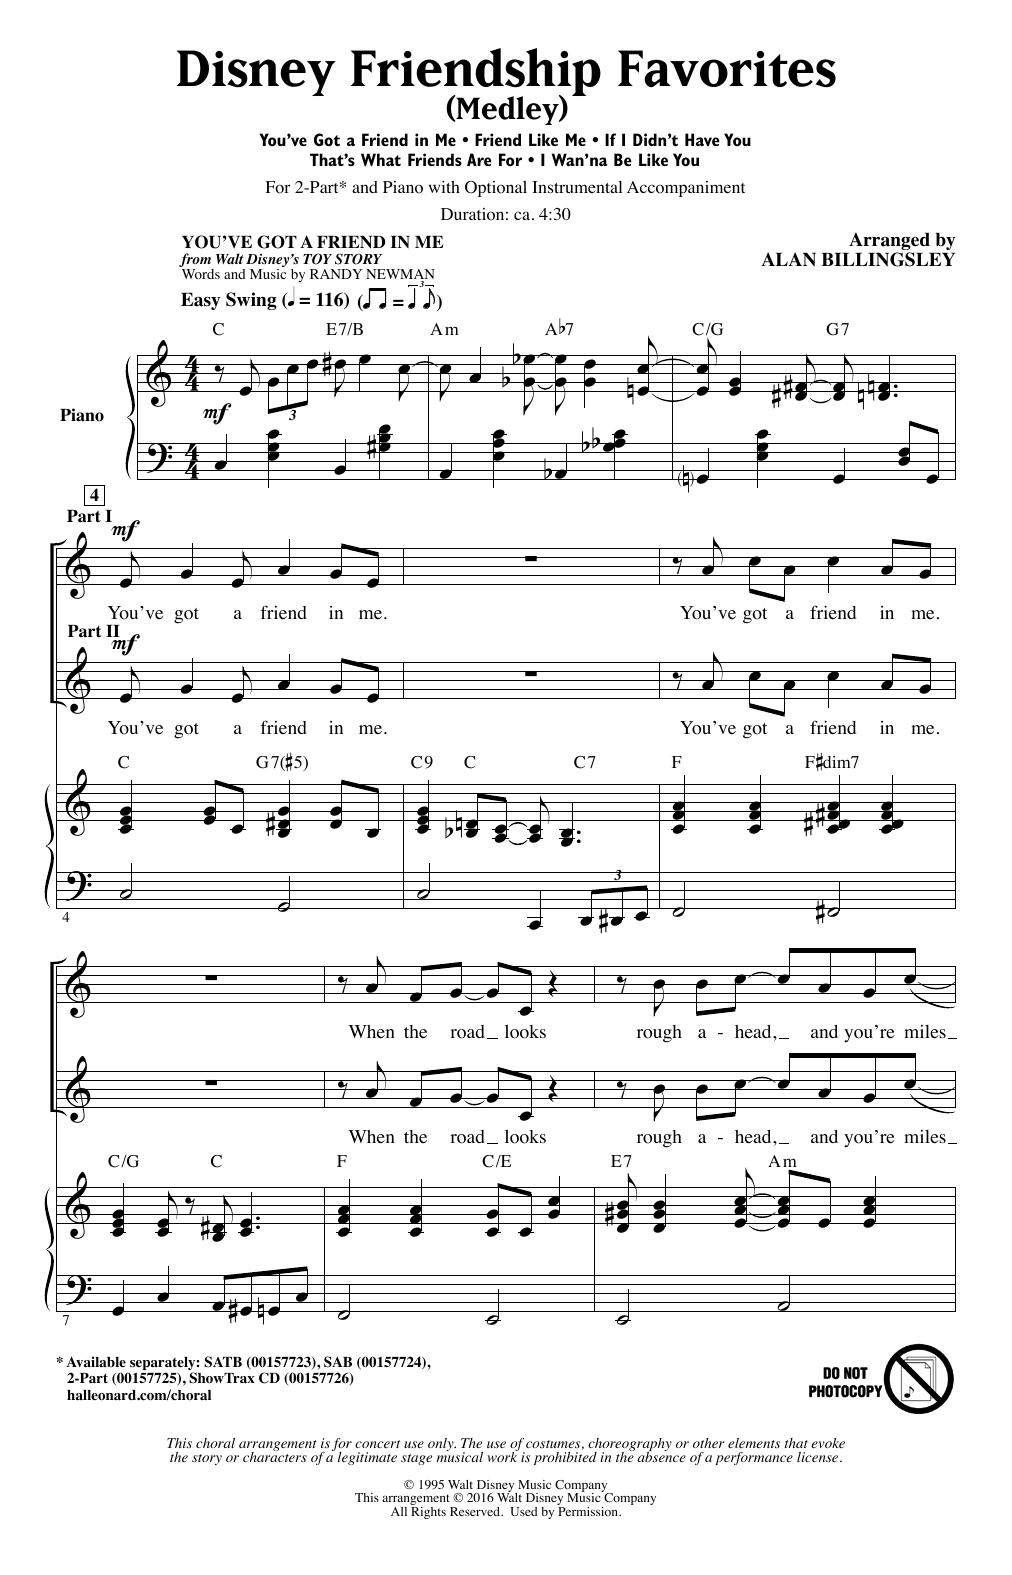 Disney Friendship Favorites (Medley) sheet music